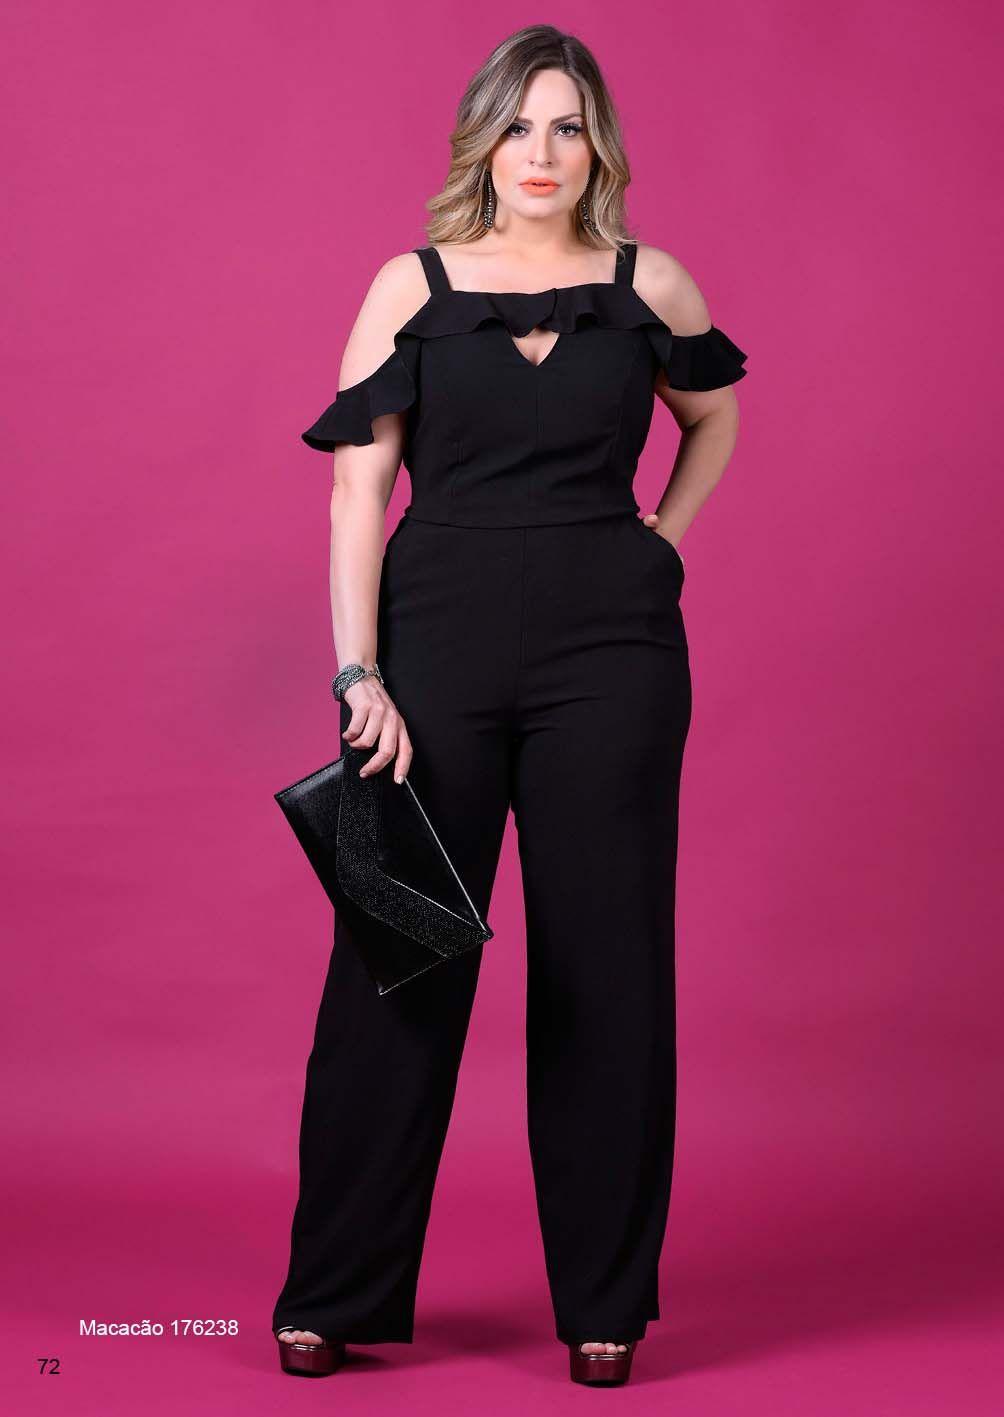 ca2a7a49b47c2c Program - Moda Feminina - Tamanhos Grandes | moda | Tamanhos grandes ...